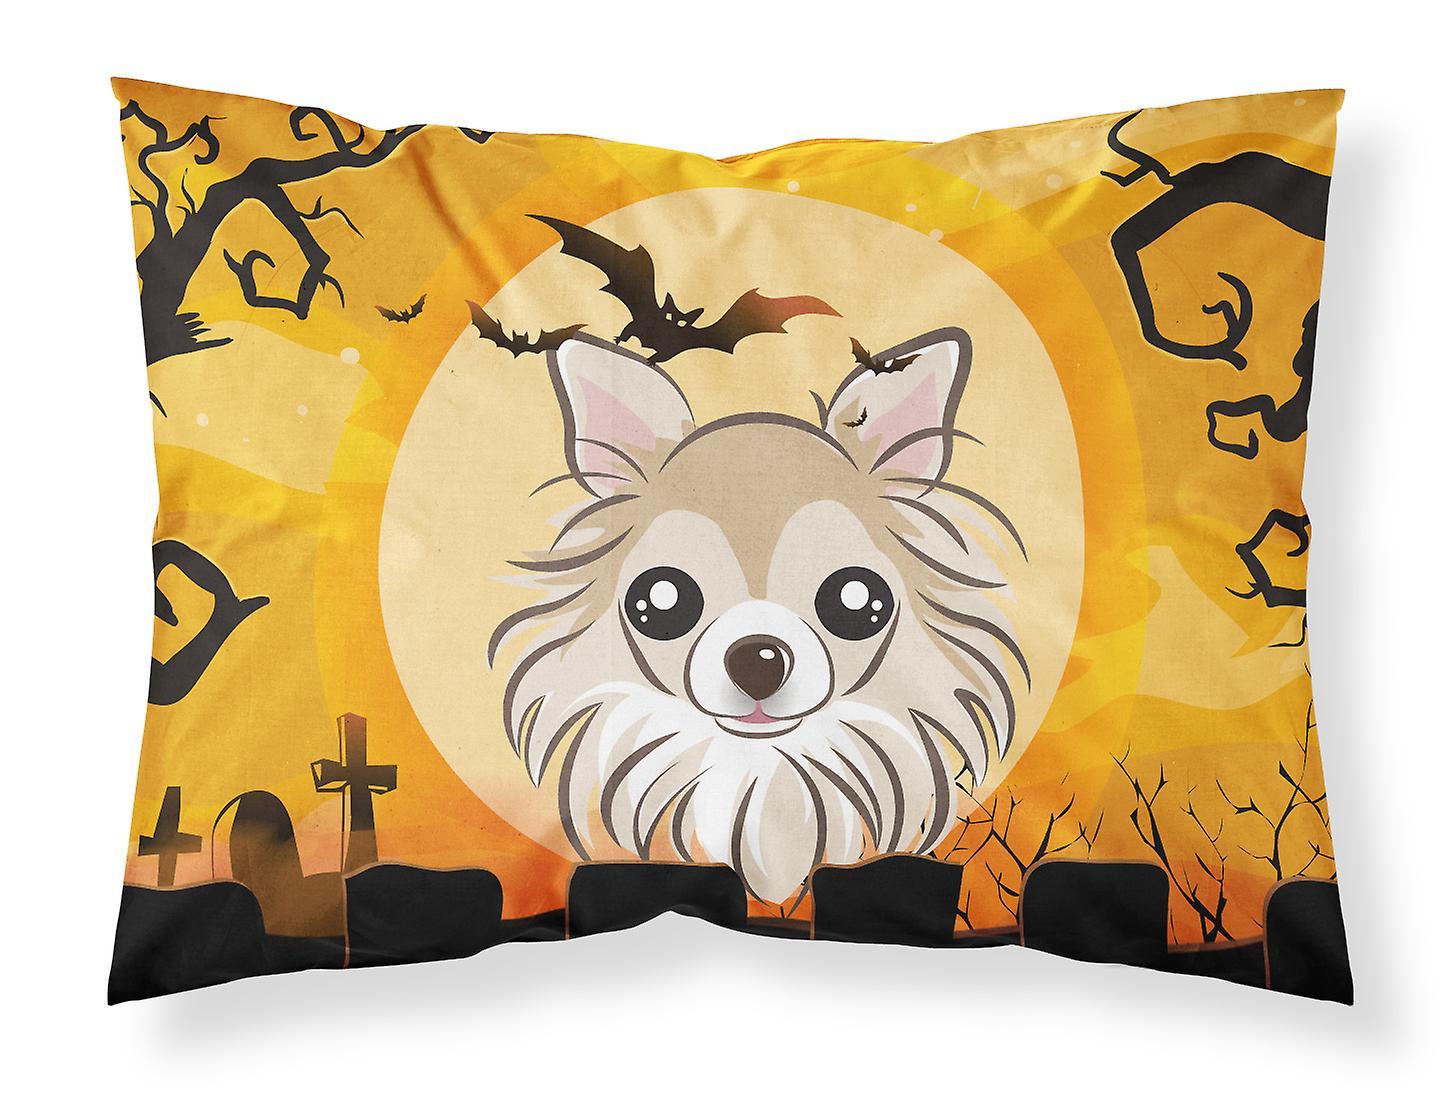 De Taie Standard Halloween Tissu Chihuahua D'oreiller eHY2IED9W